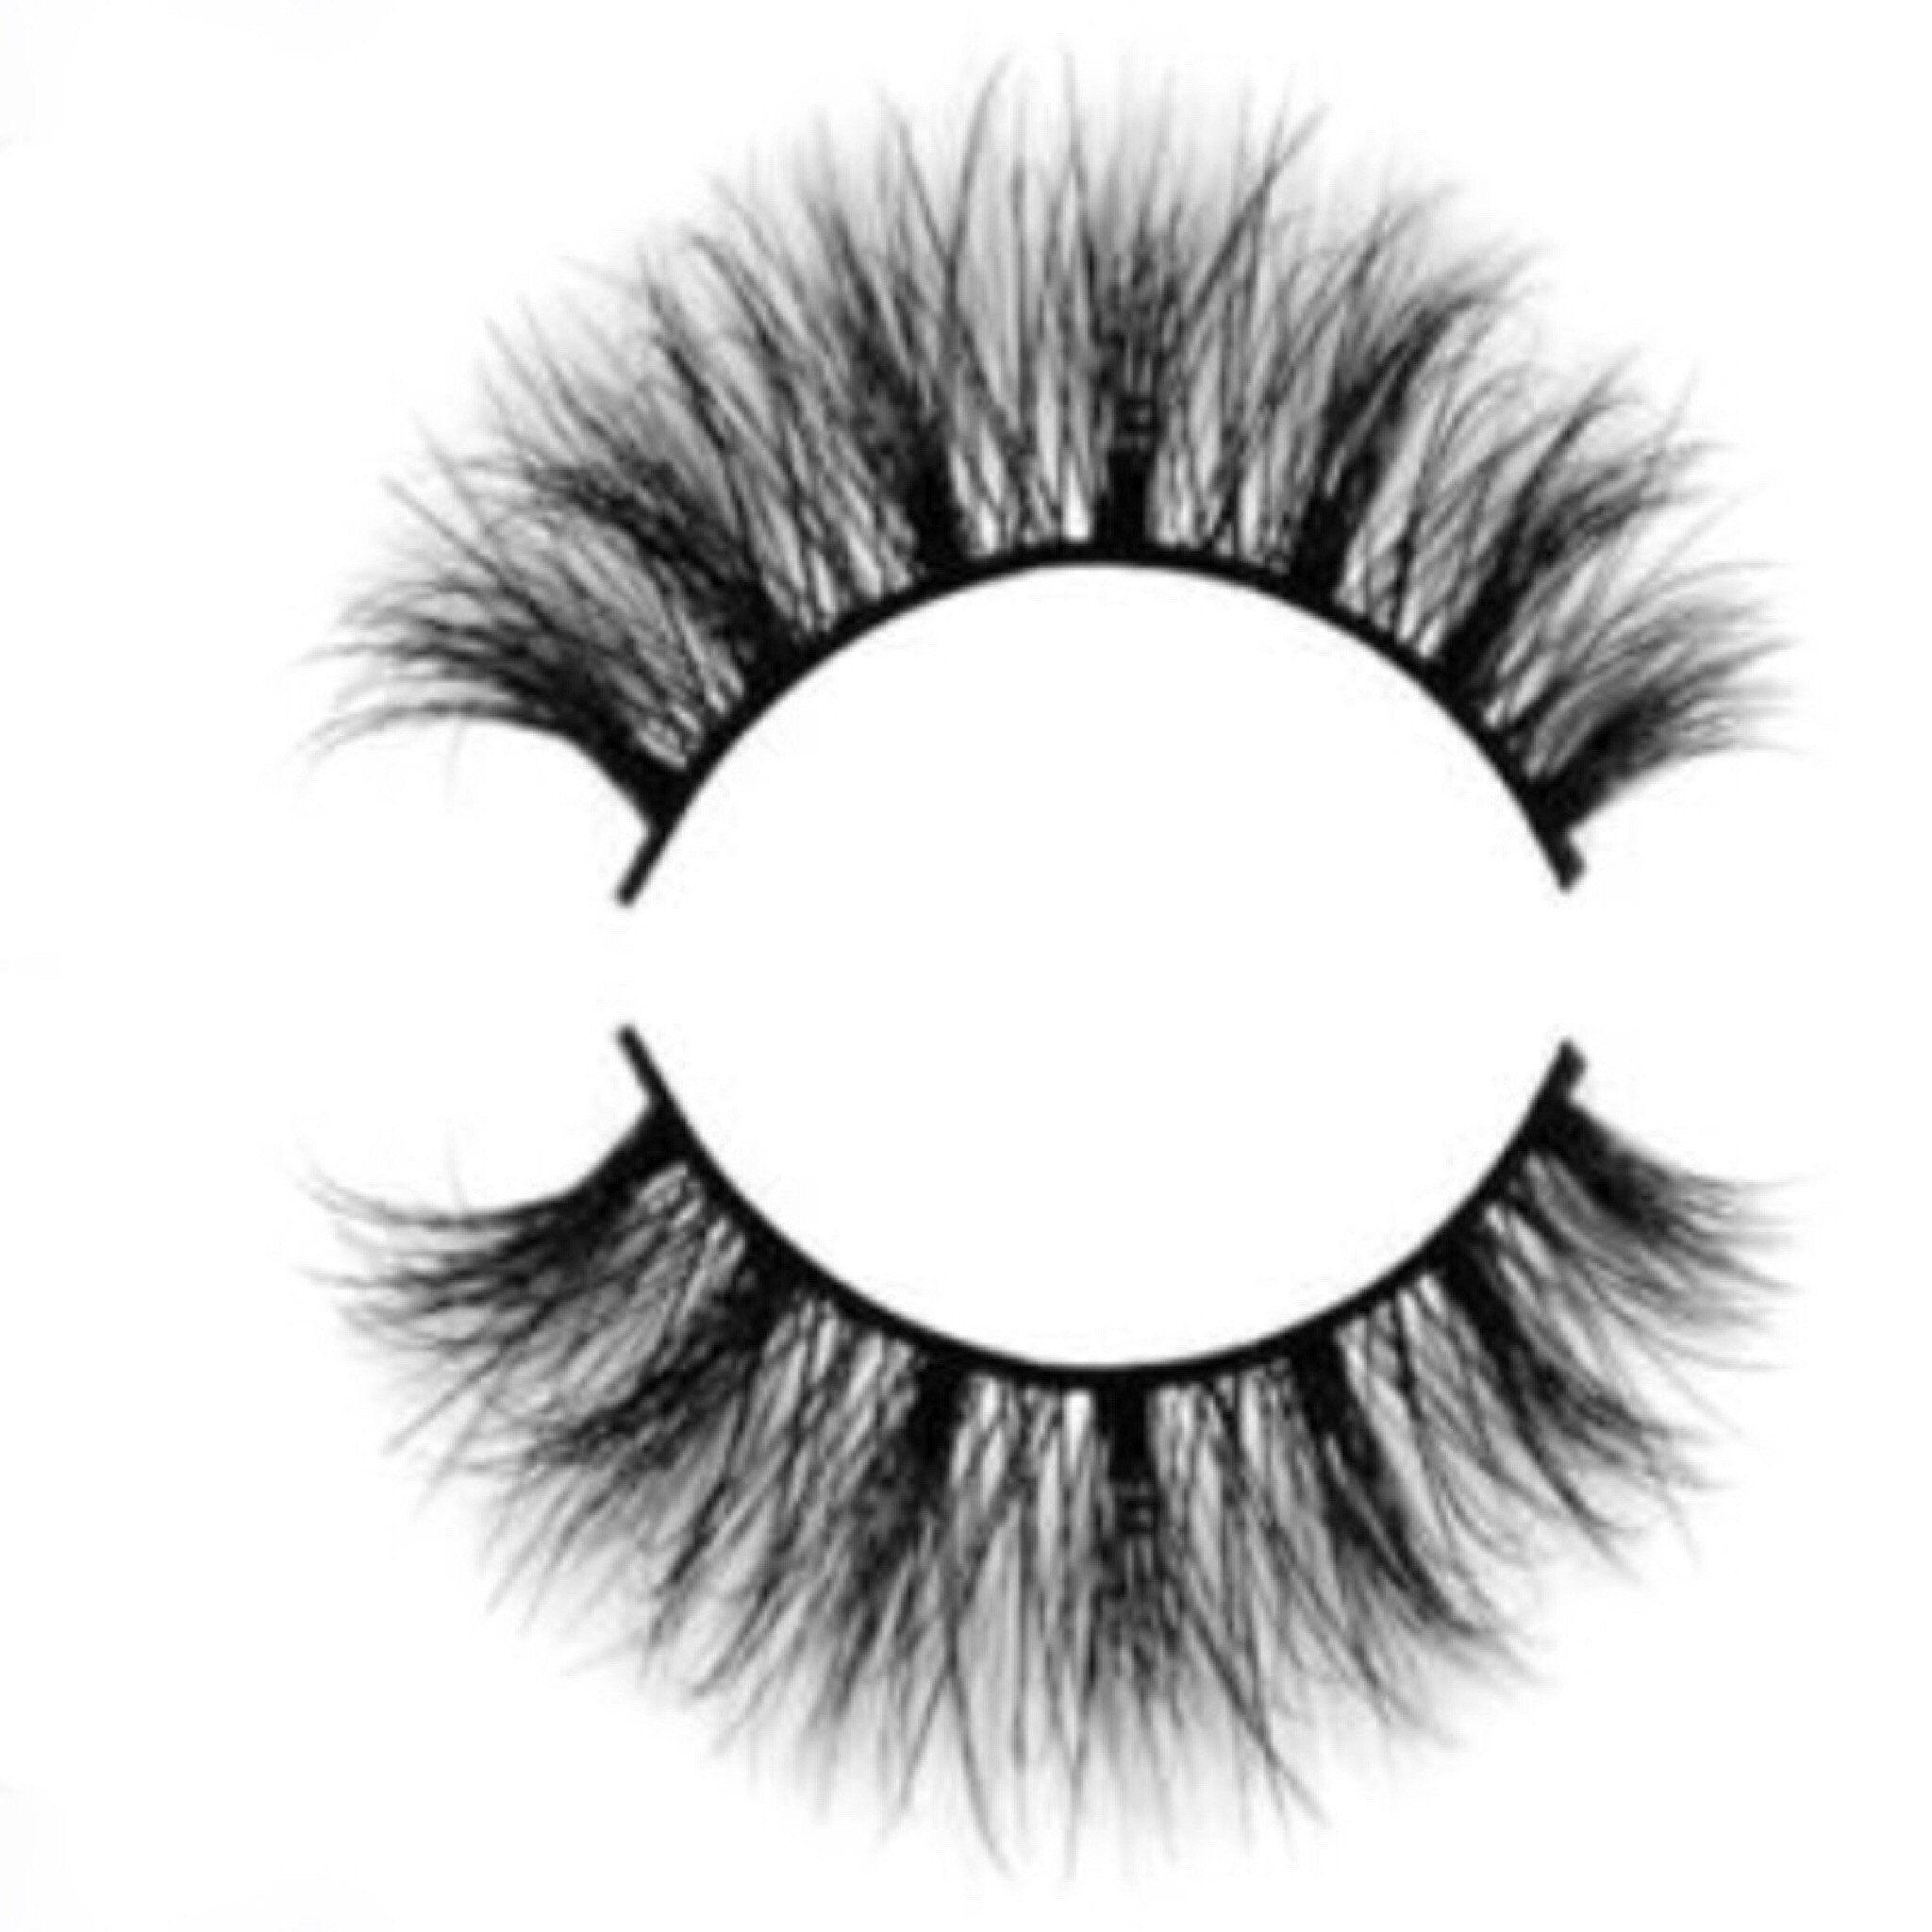 Serenity 3d Mink Lashes 3d Mink Lashes Lashes Makeup